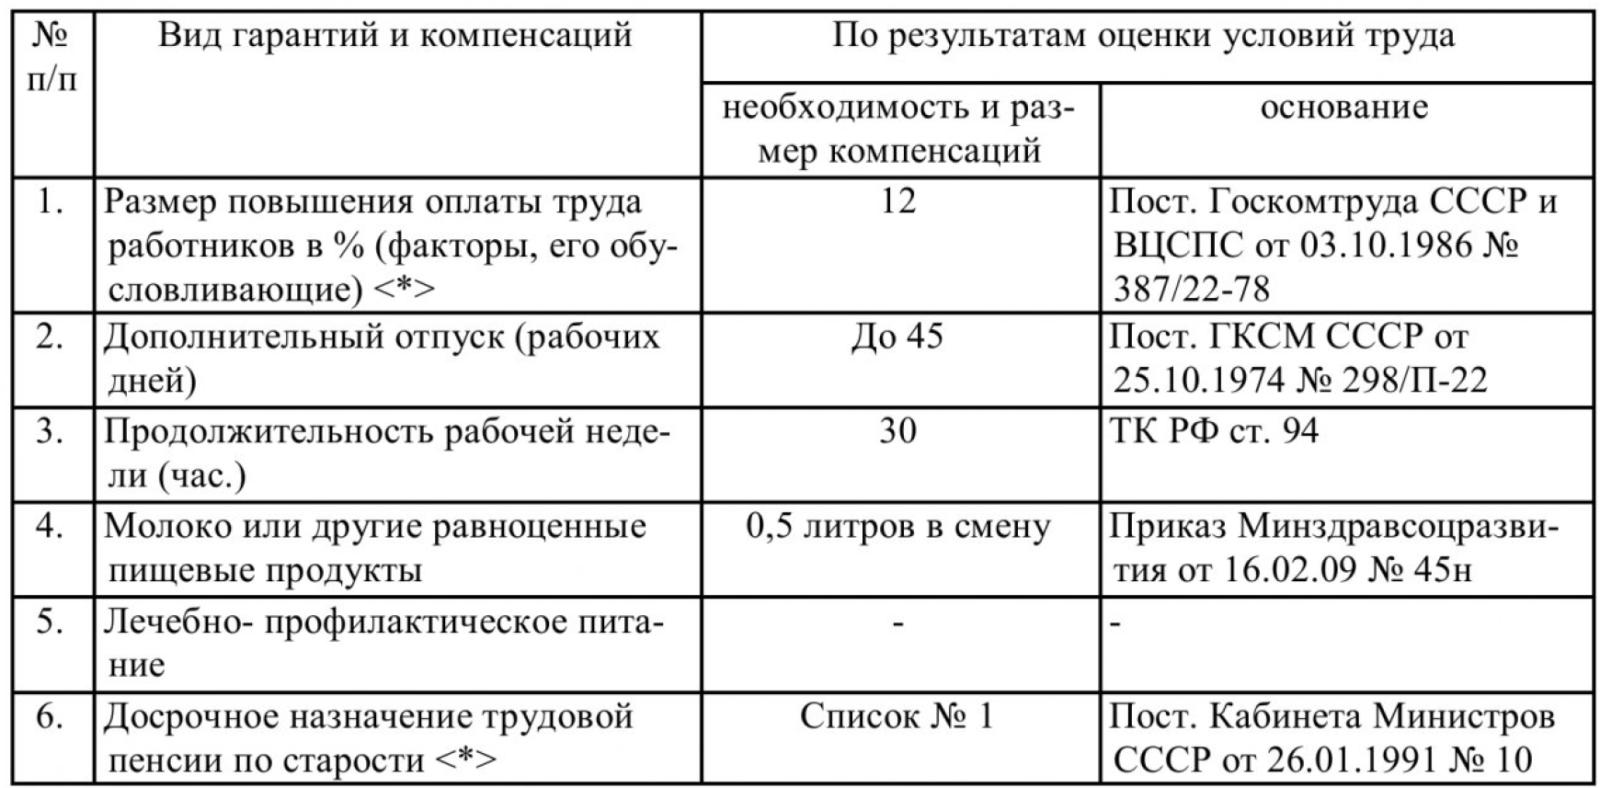 Таблица 2 – Гарантии и компенсации на примере АРМ электрогазосварщика